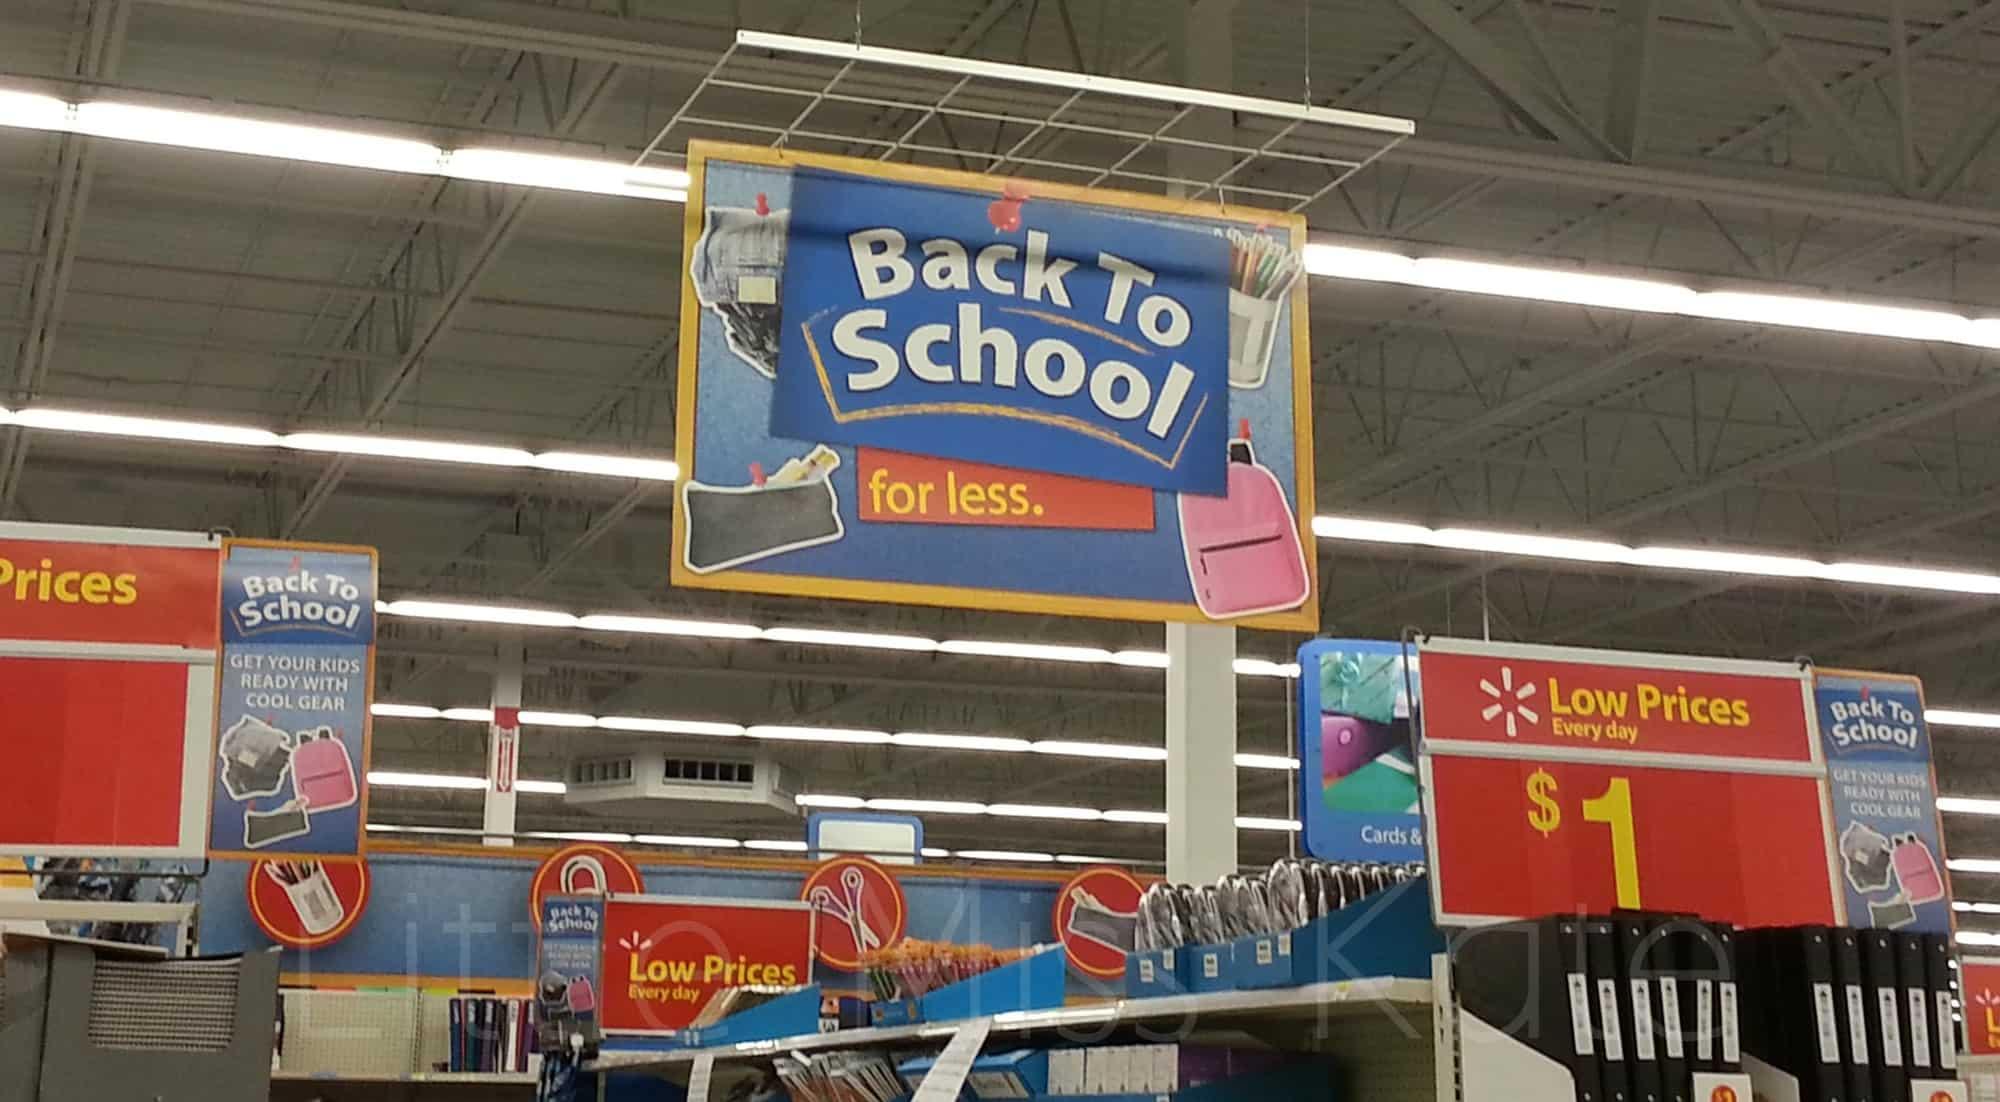 Elmers walmart back to school #shop